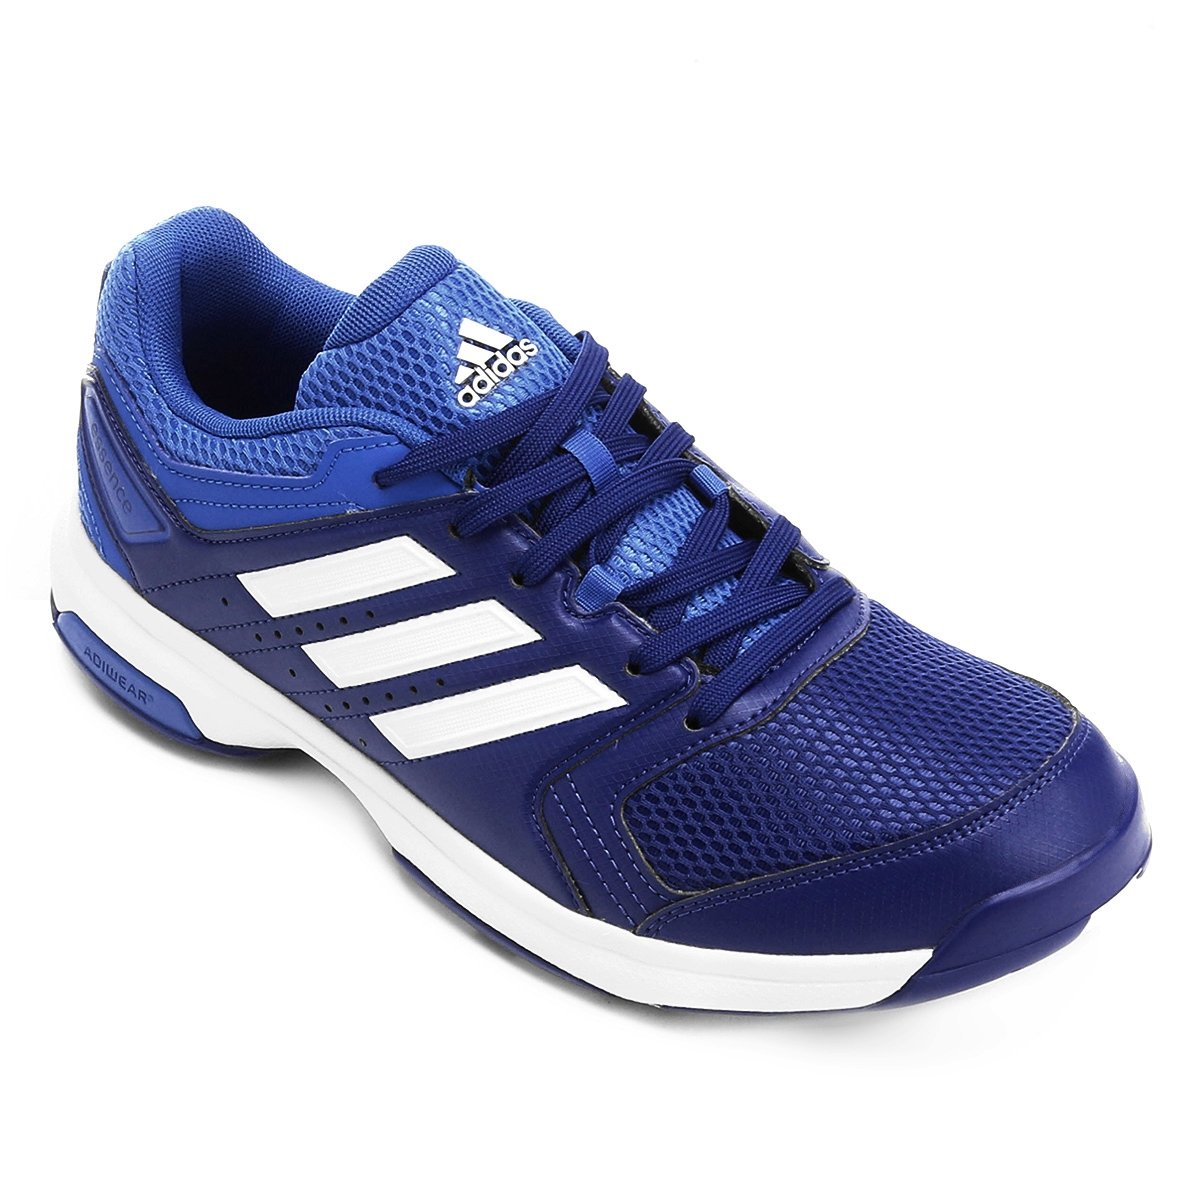 Tênis Masculino Adidas Essence BY2448 Azul Branco 6dc55a43ab2b0